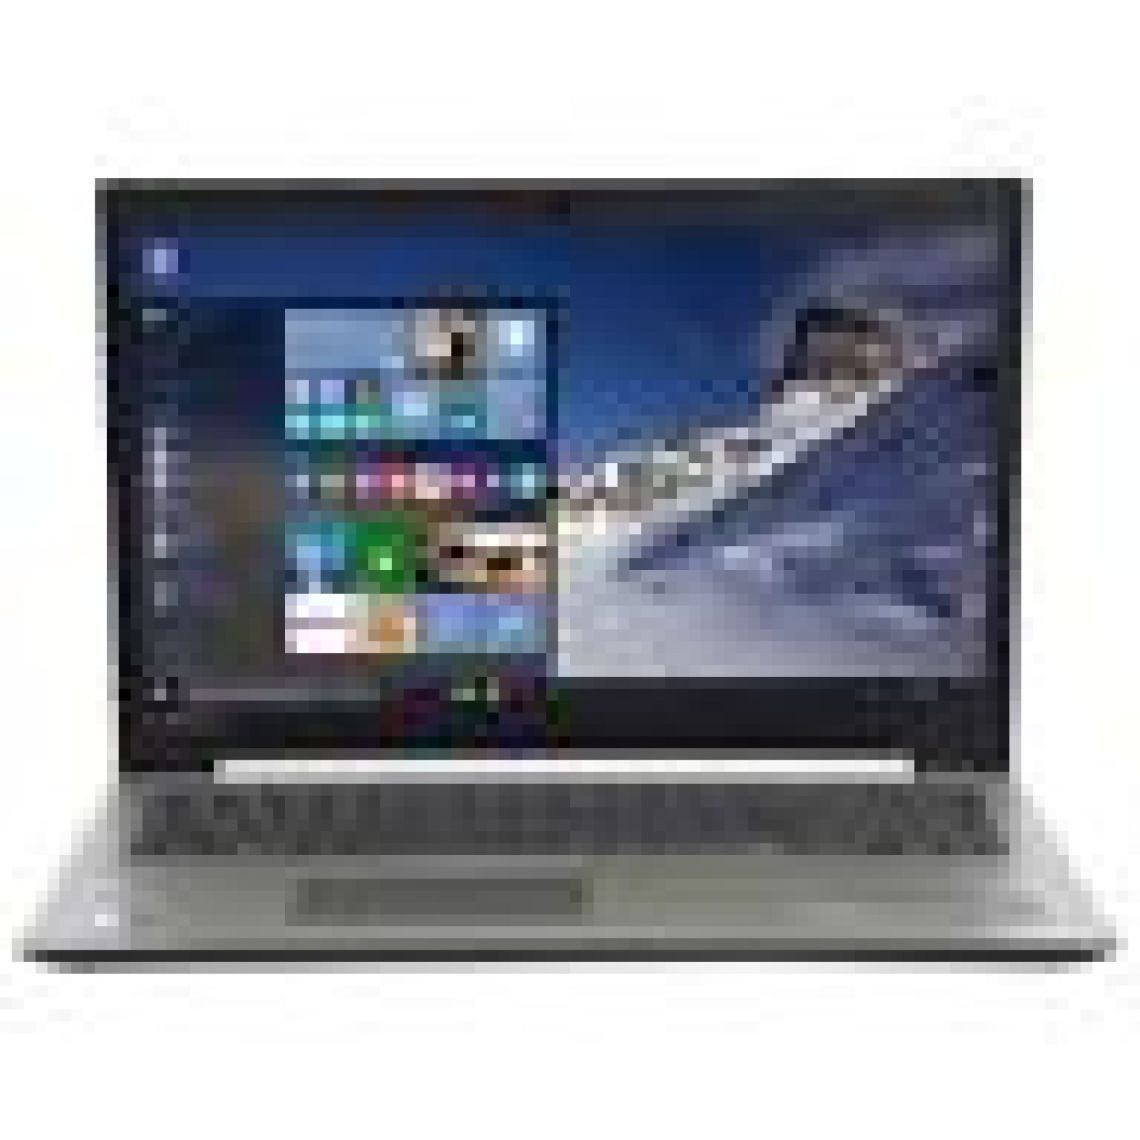 "Inspiron 17 5000 - 17.3"" Laptop - Intel 8th Gen i5- 1TB HDD- 8 GB RAM - Win 10 884116311140 | eBay"